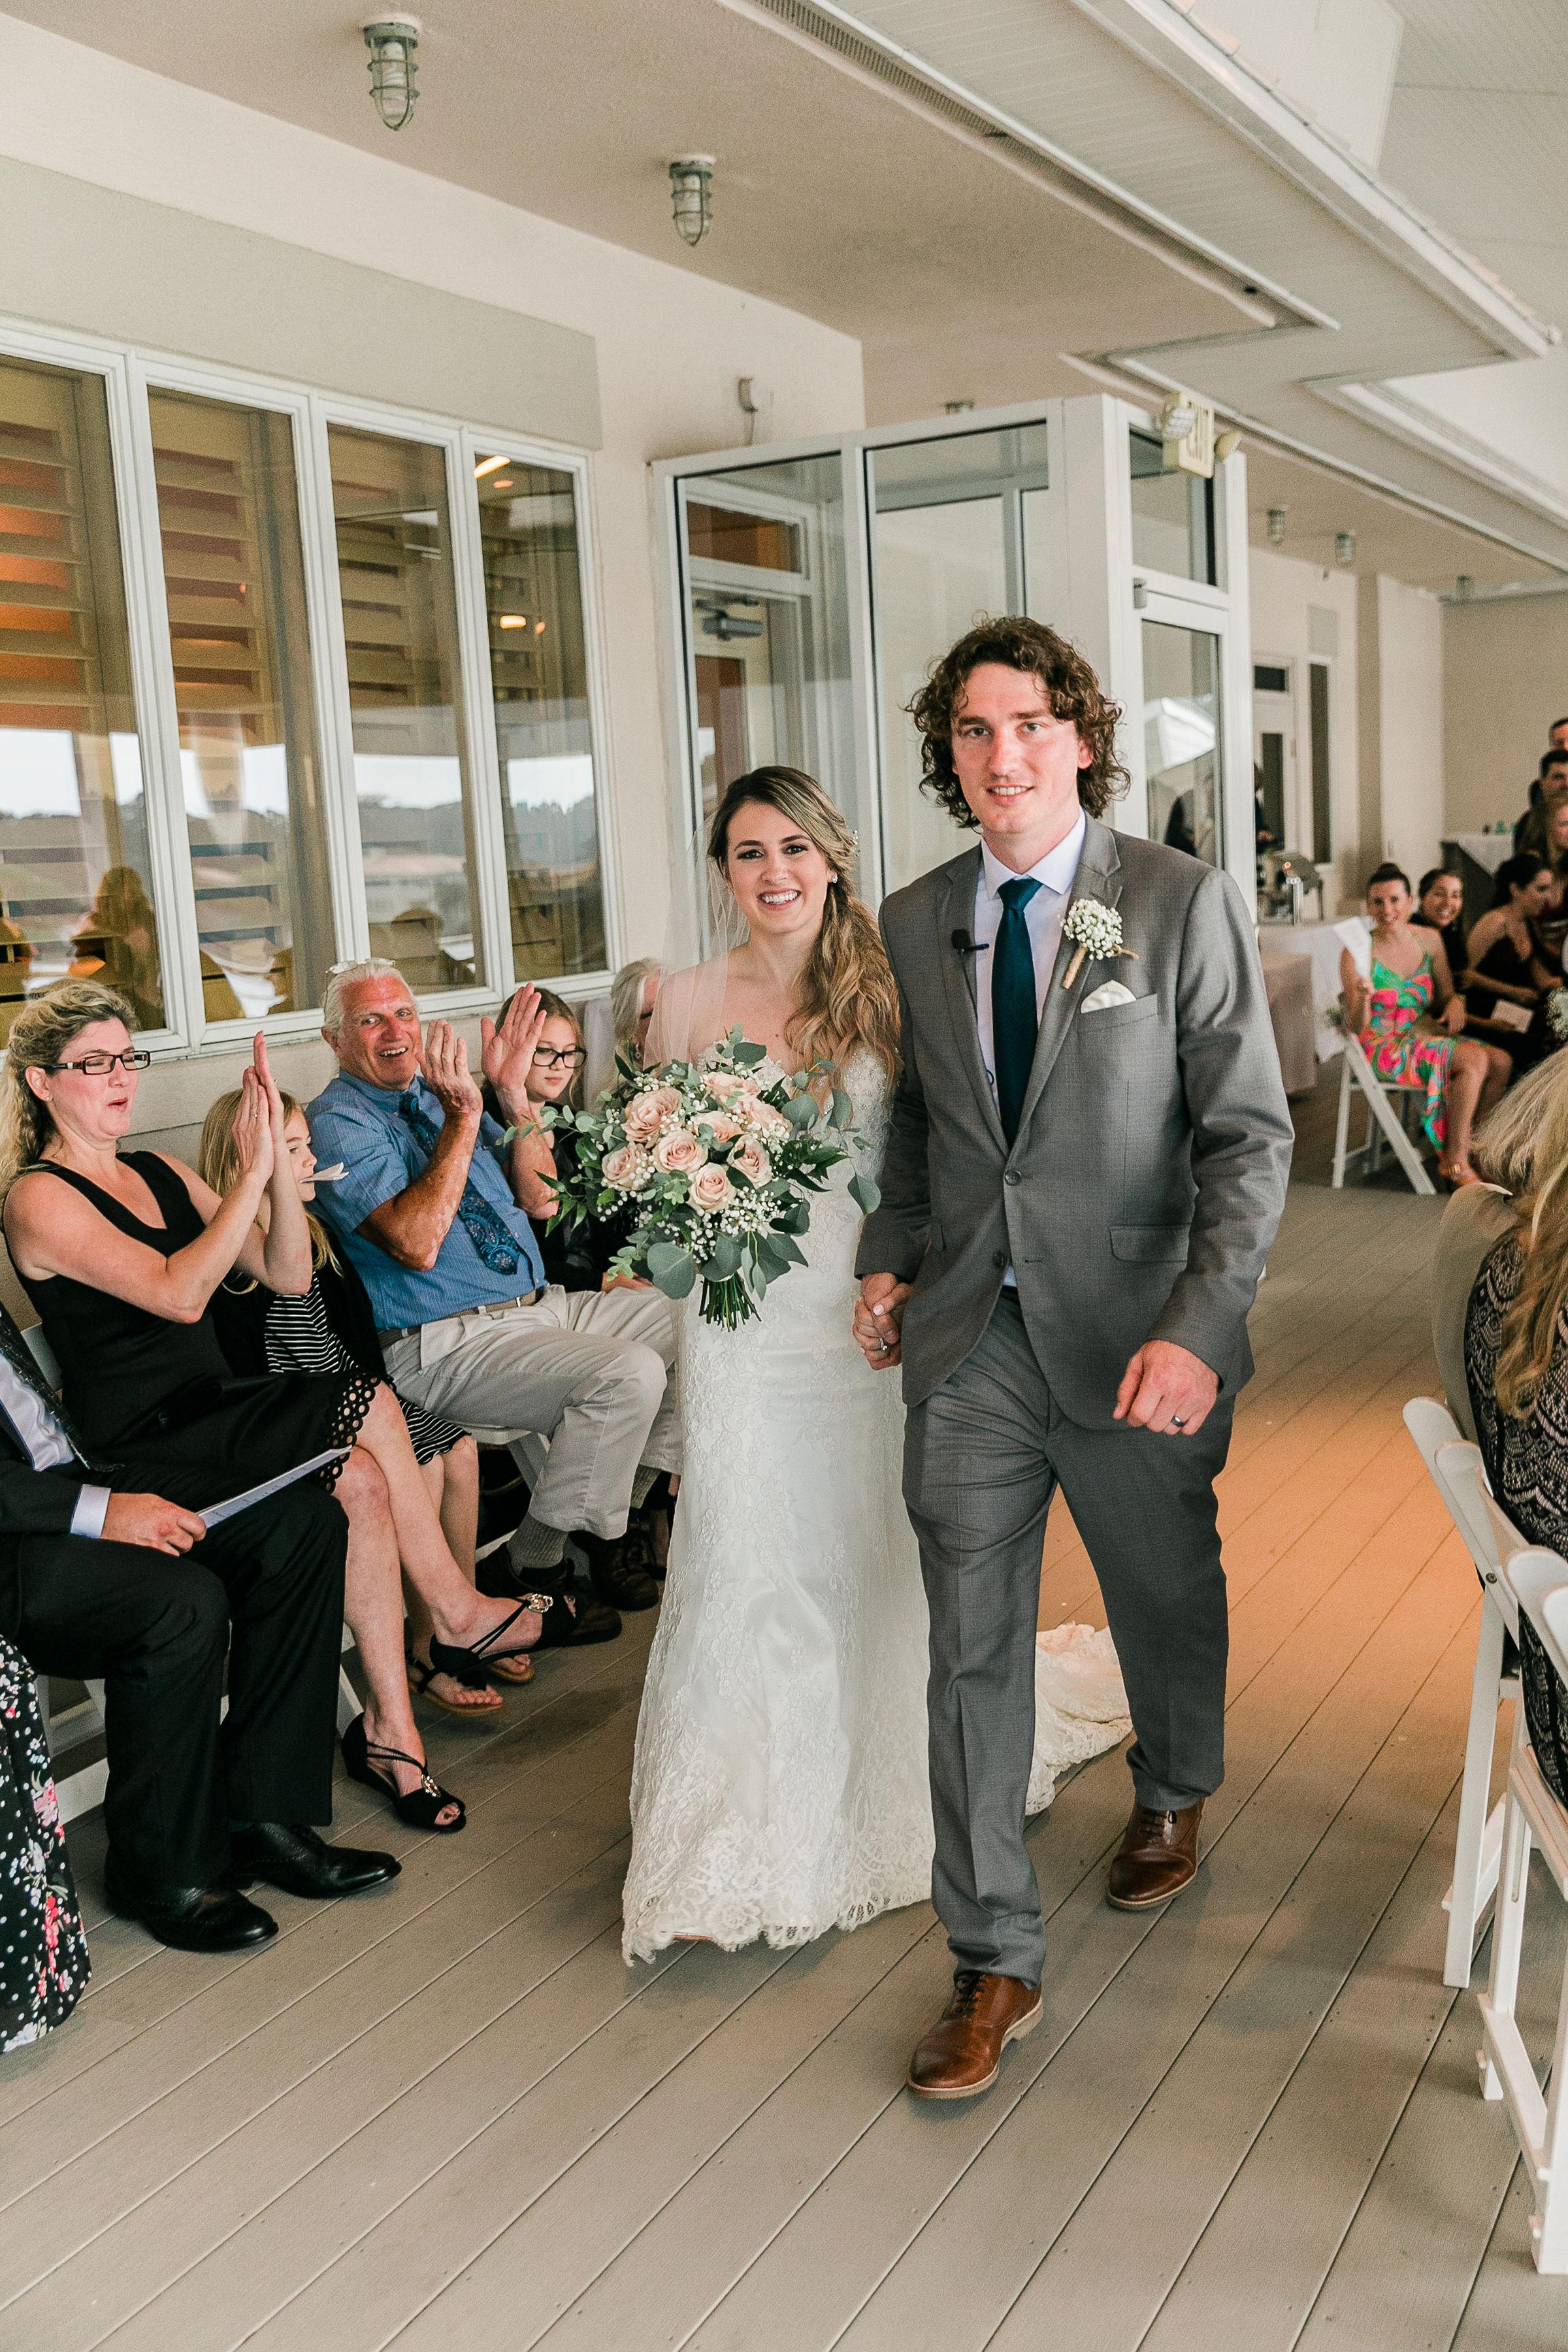 Nicole&Bryce_Ceremony-106.jpg